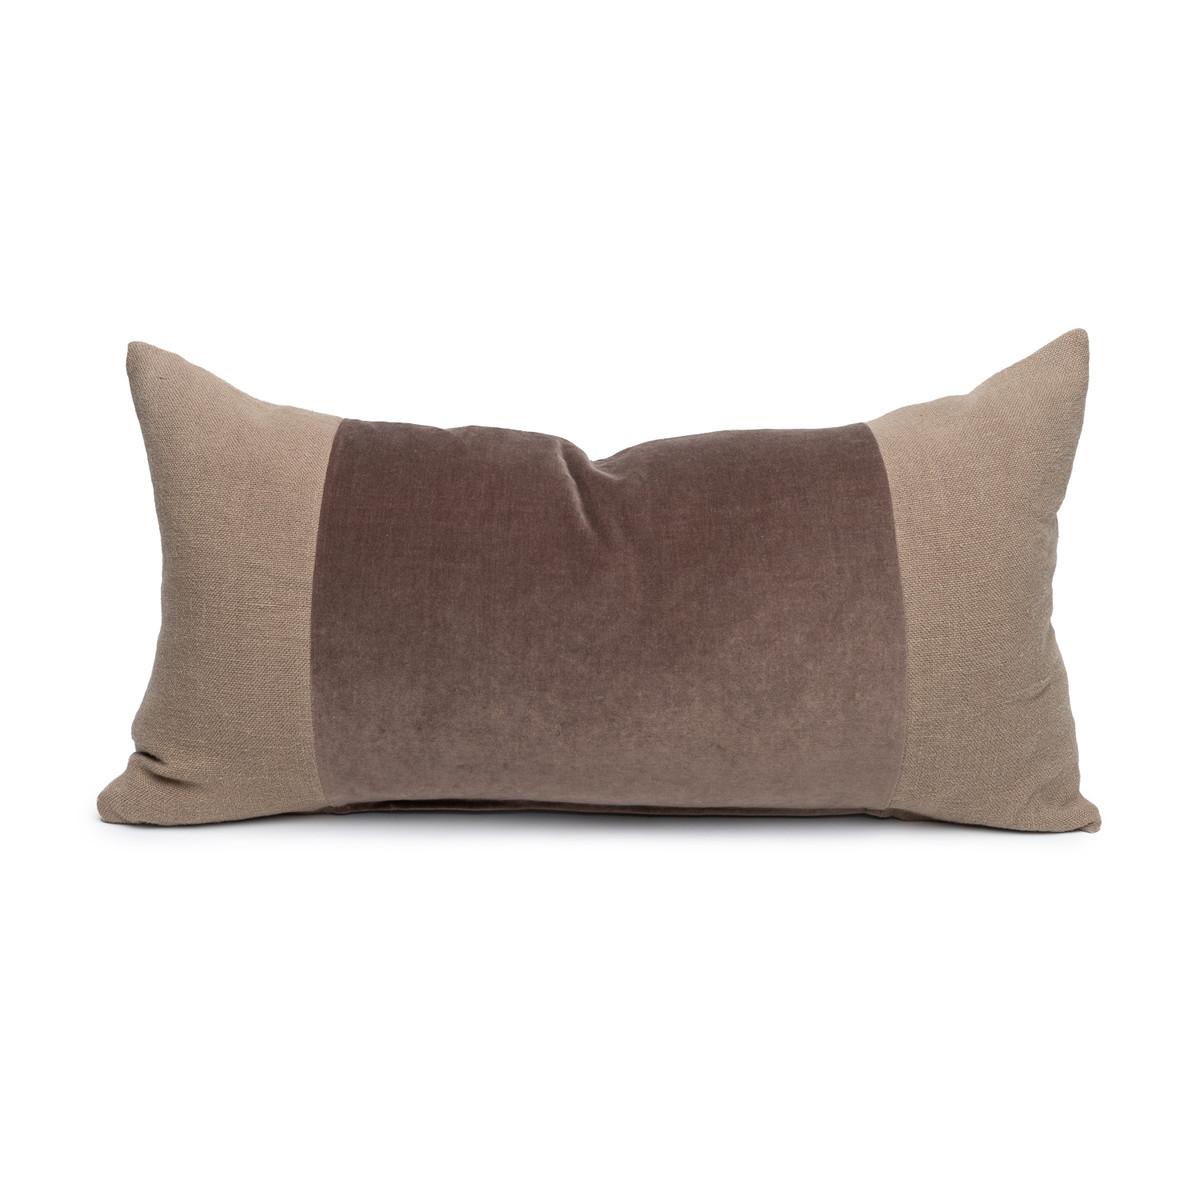 Chante Smokey Topaz Velvet Lumbar Pillow - Front